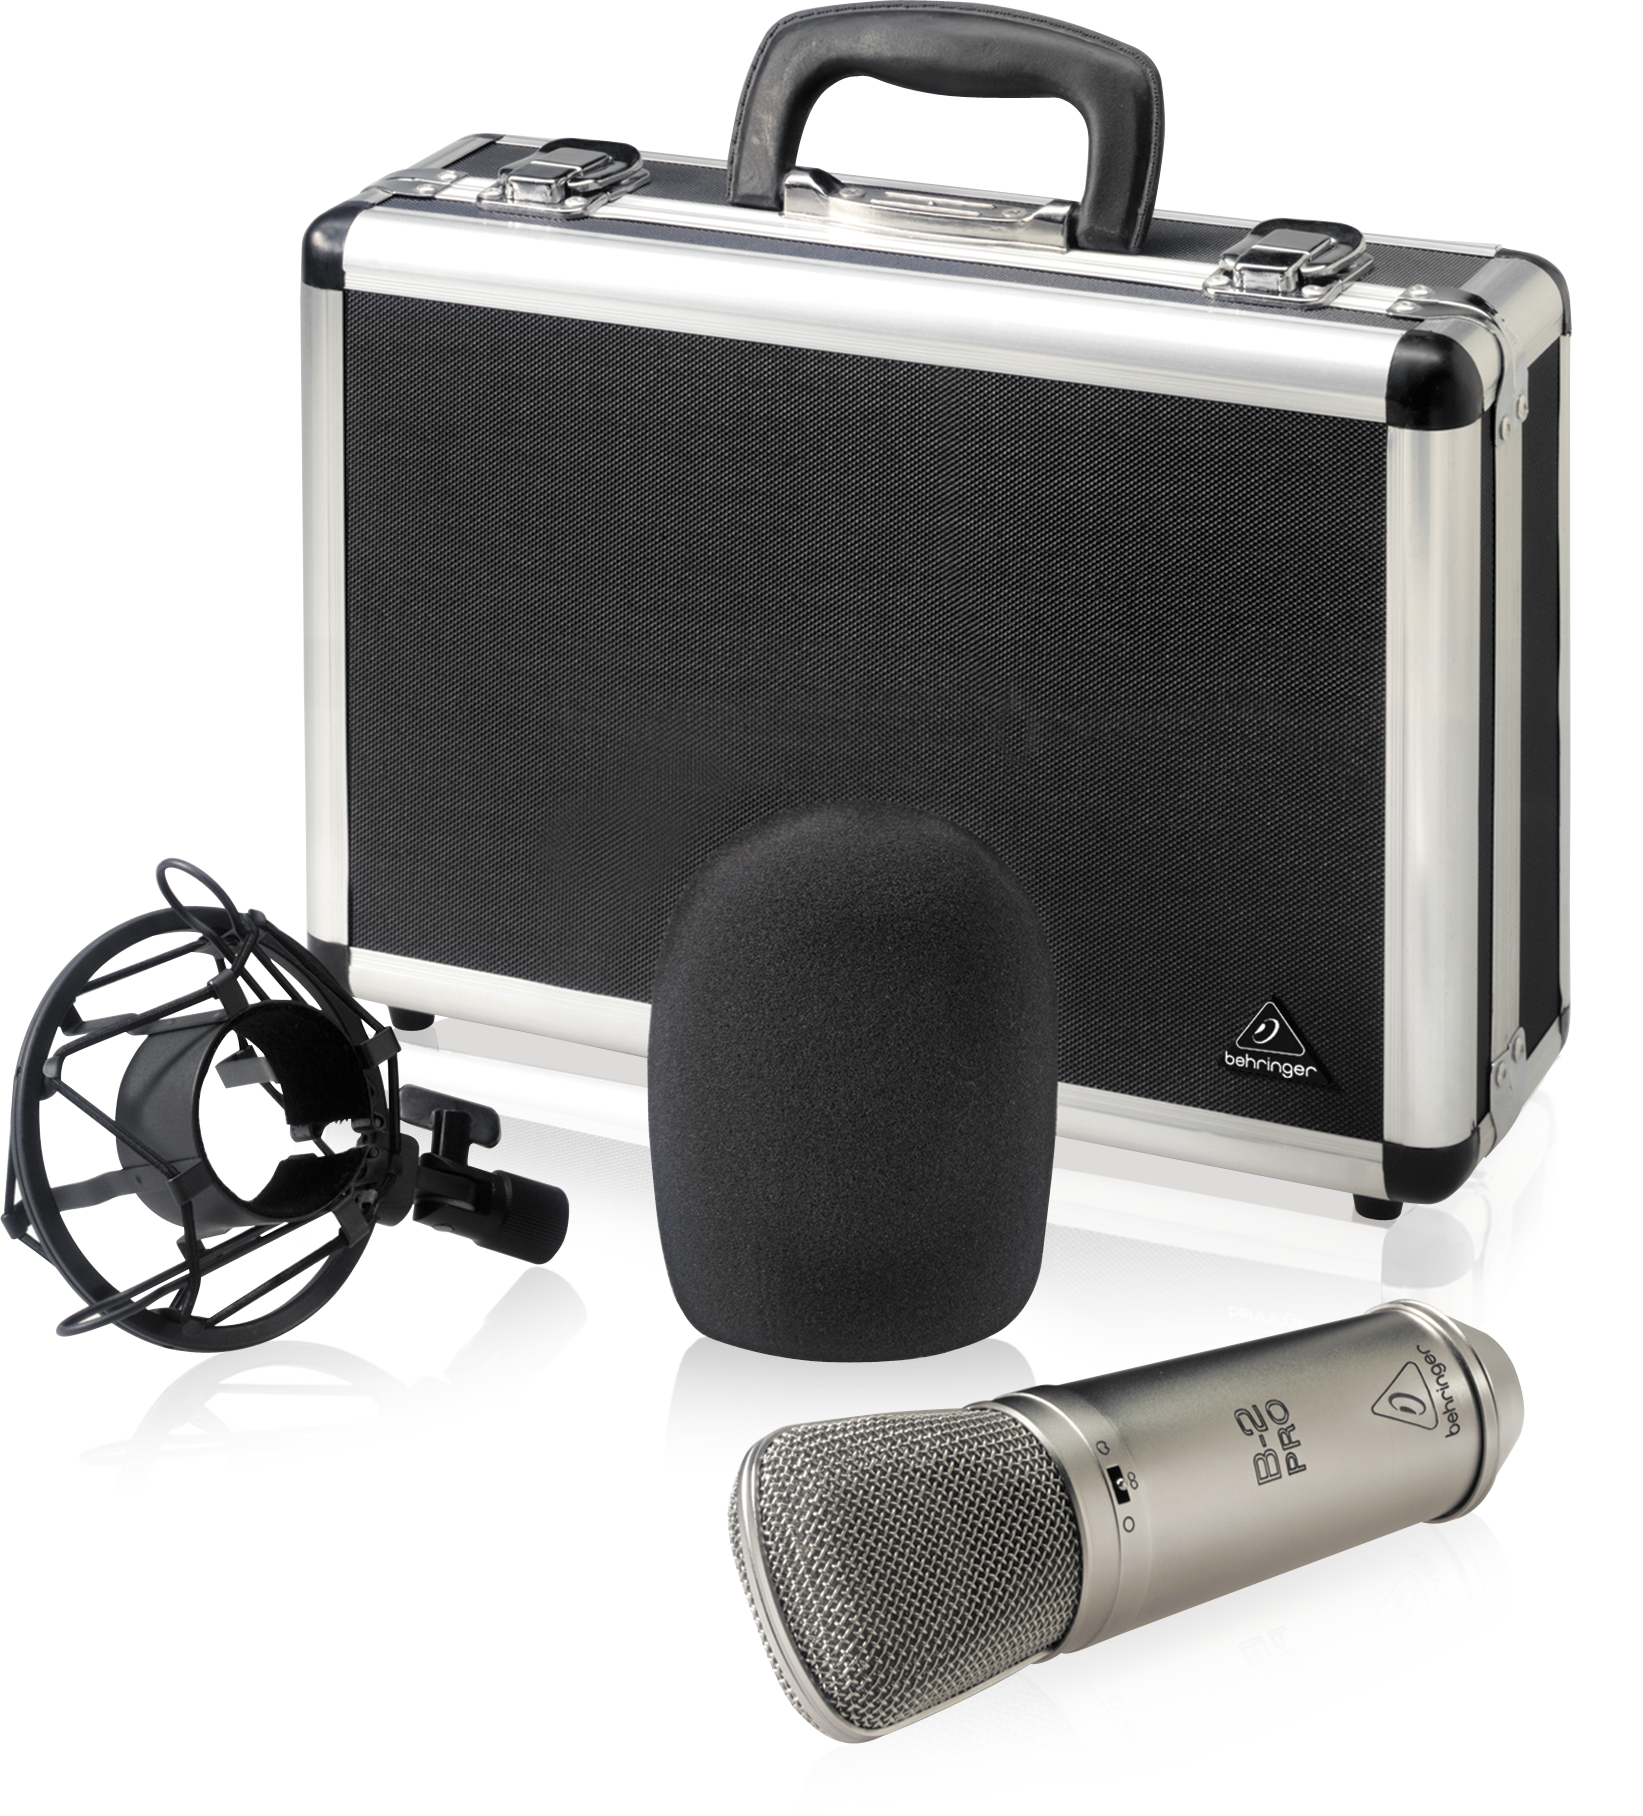 Micro Behringer B2 Pro | Micro Condenser | HayAudio.com